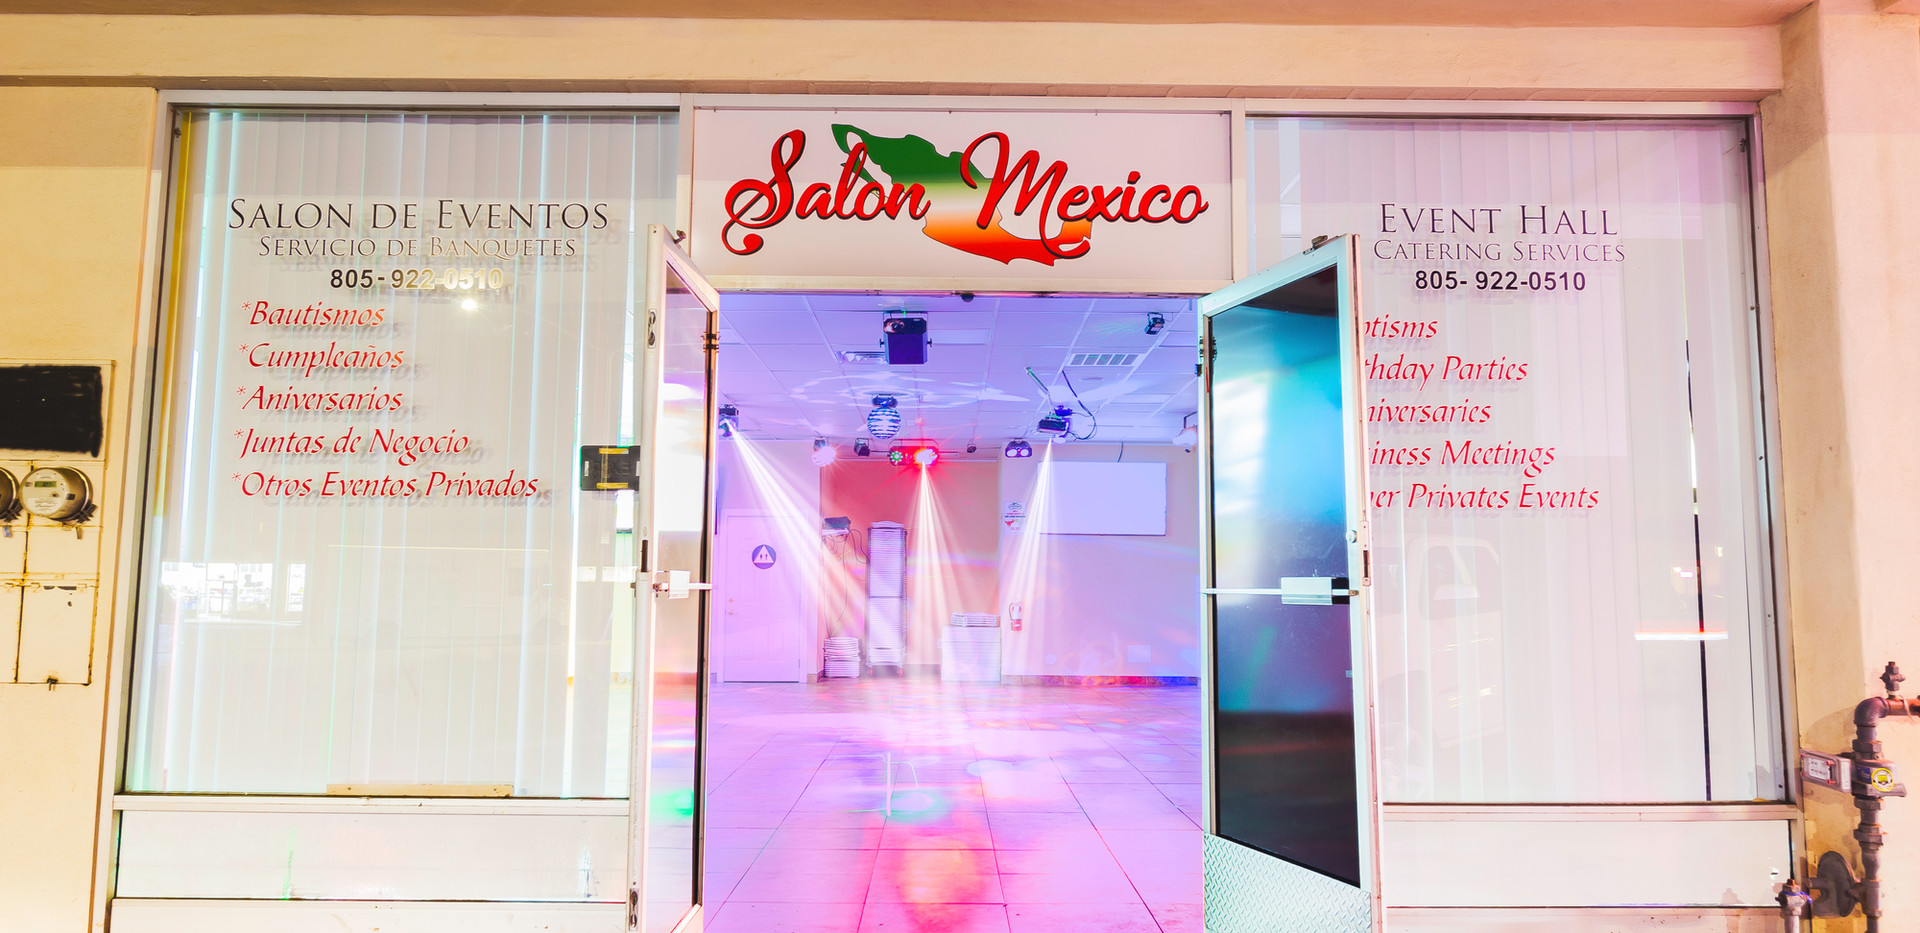 Salon Mexico 2.jpg